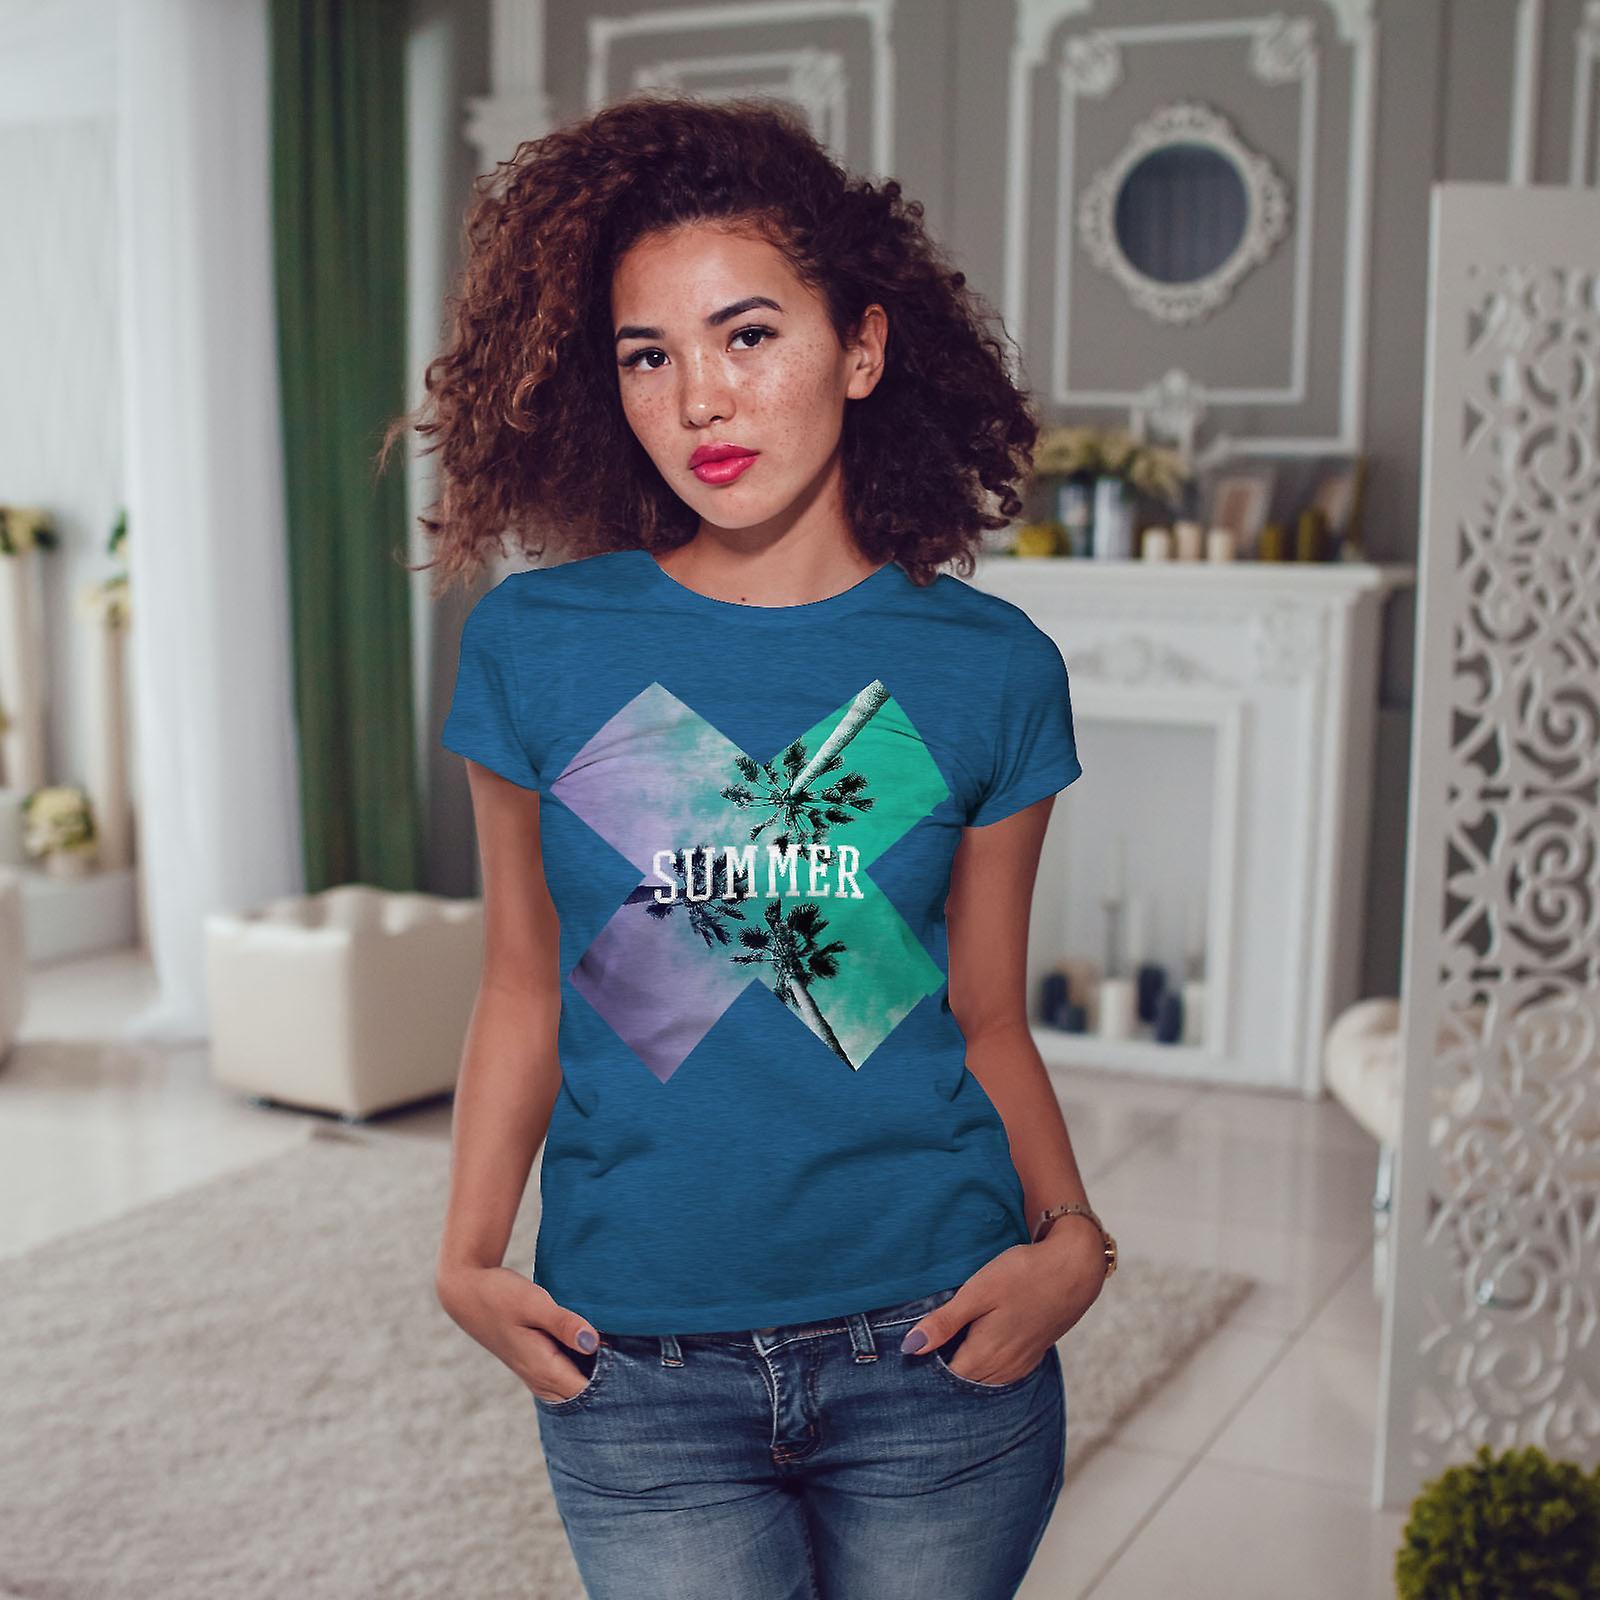 Location vacances vacances BlueT-shirt Royal femme | Wellcoda